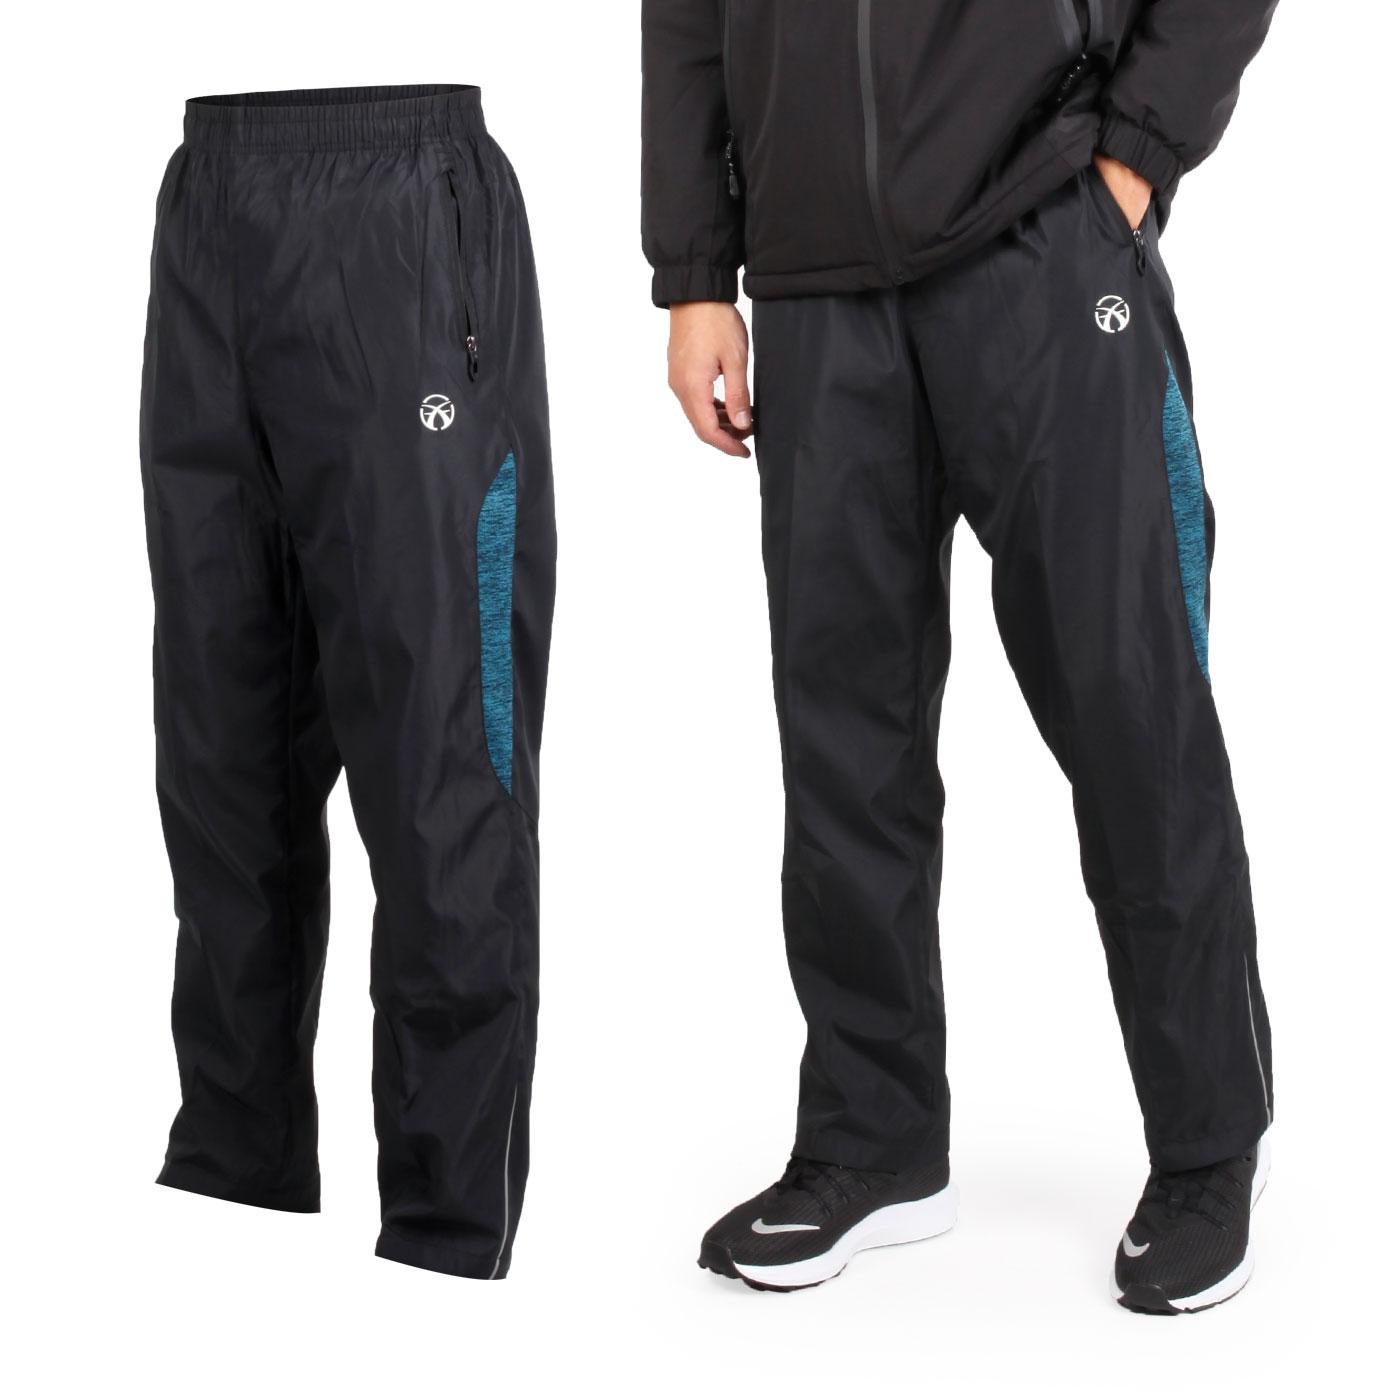 FIRESTAR 男款防風平織長褲 P8170-17 - 黑白藍綠